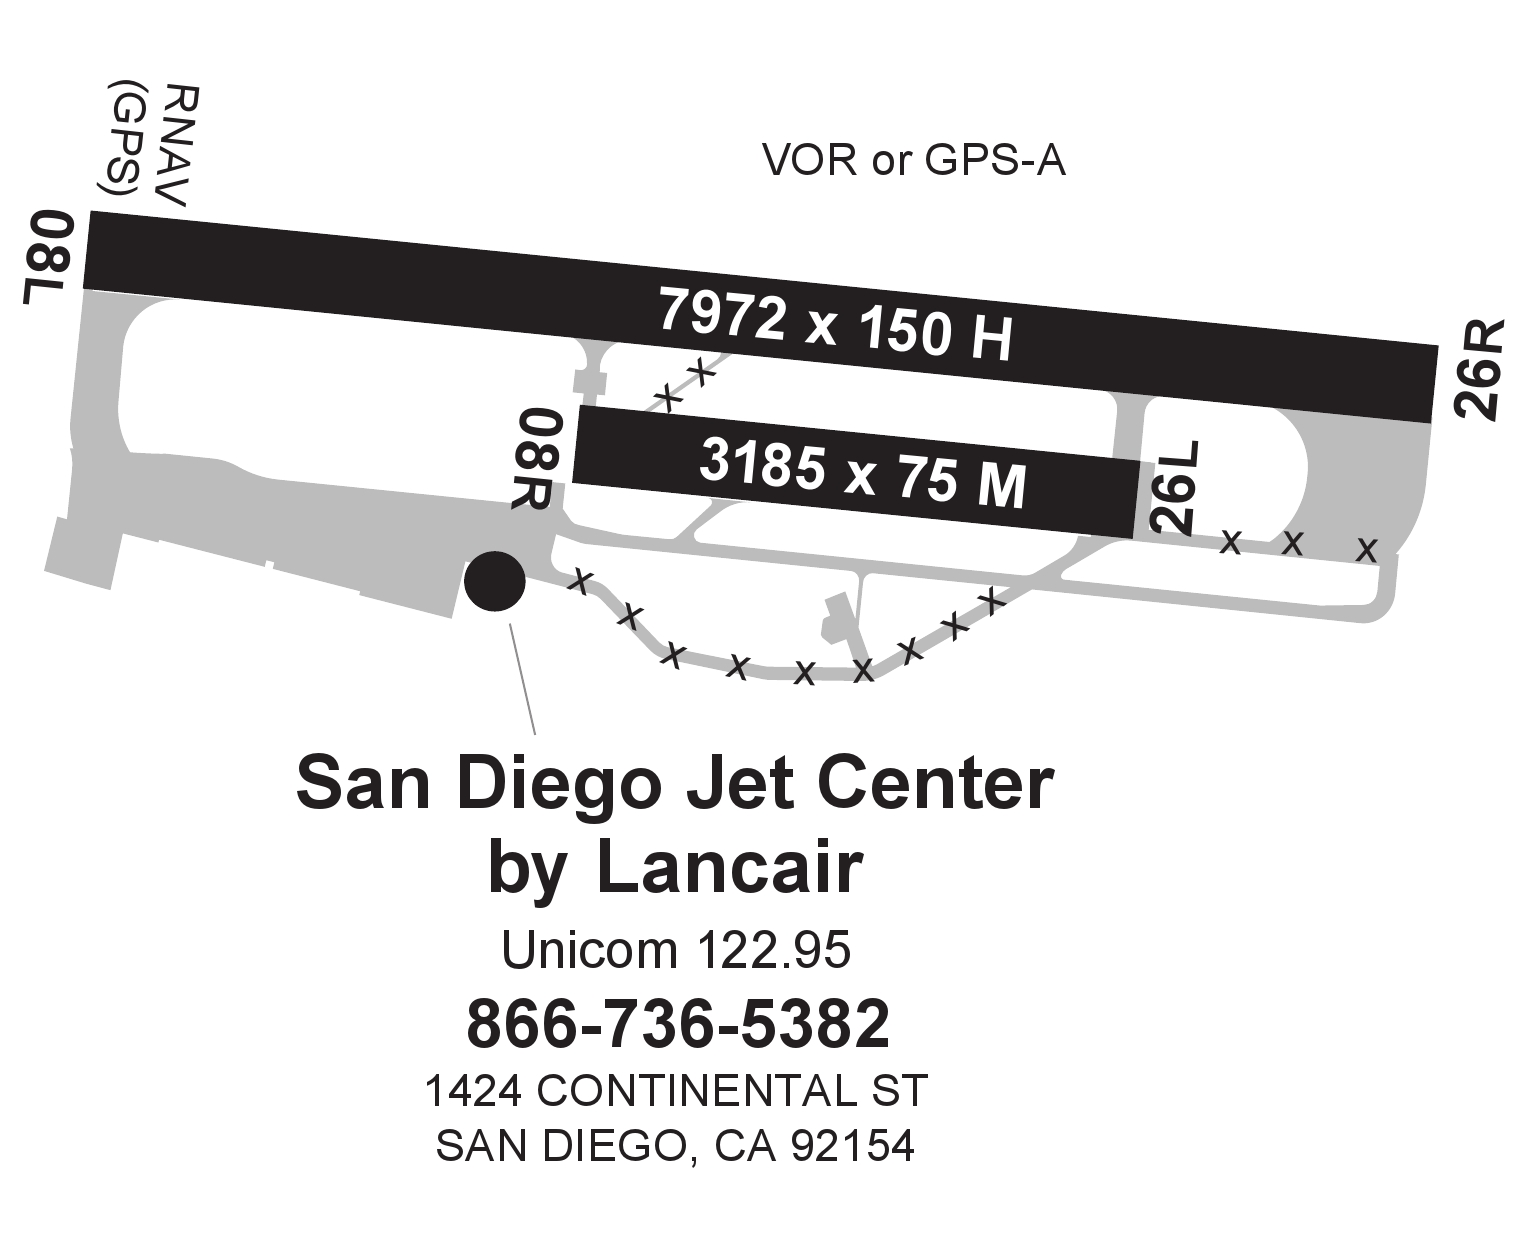 Sango Jet Center